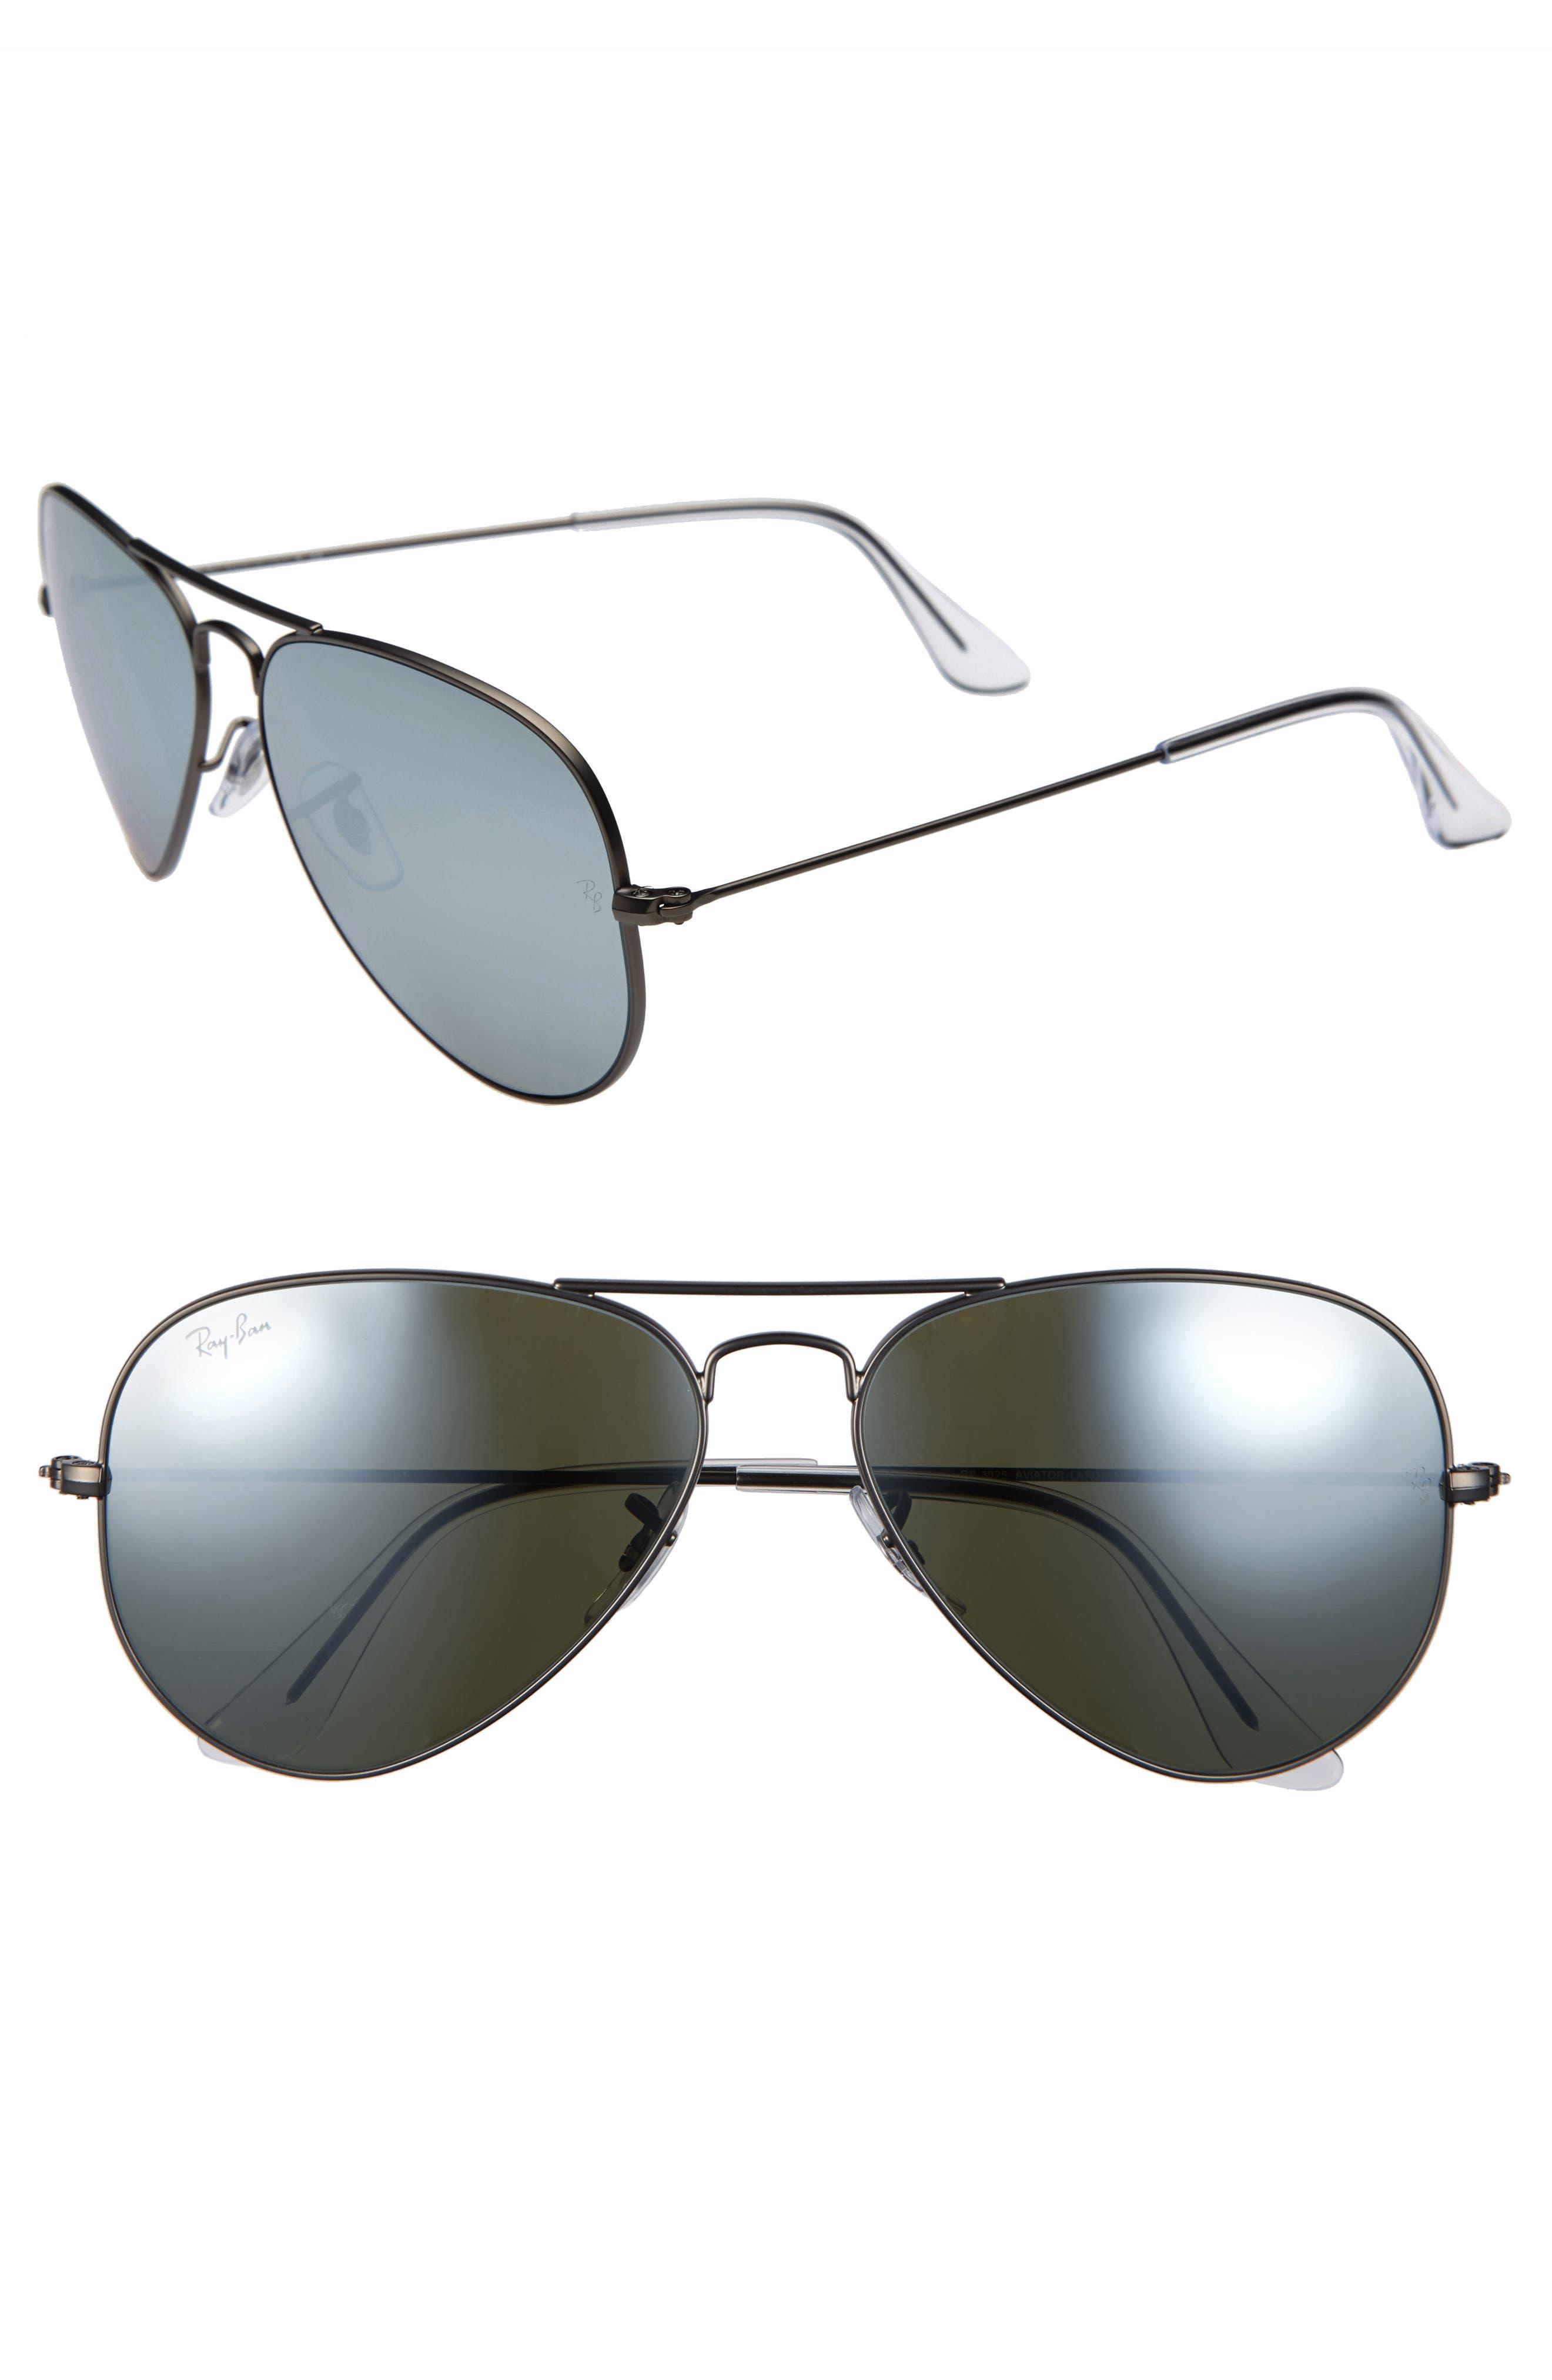 Original Aviator 58mm Sunglasses,                             Main thumbnail 1, color,                             MATTE GUN/ SILVER GREEN MIRROR